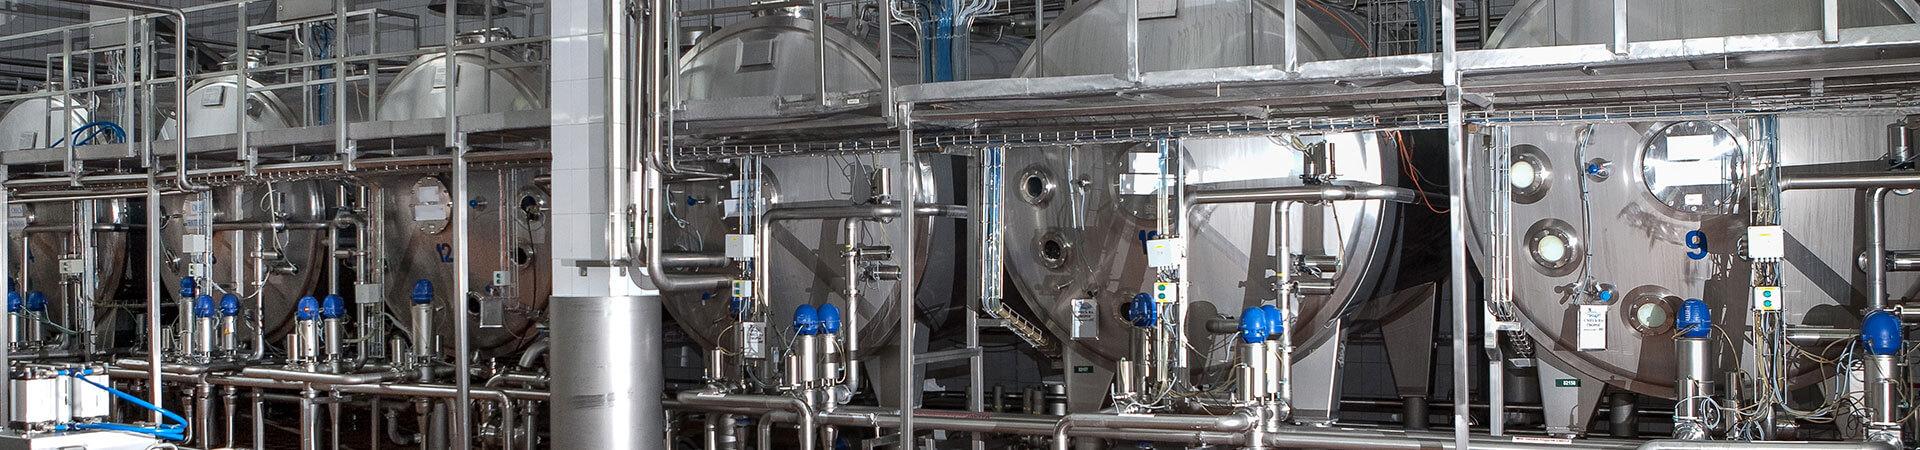 process manufacturing